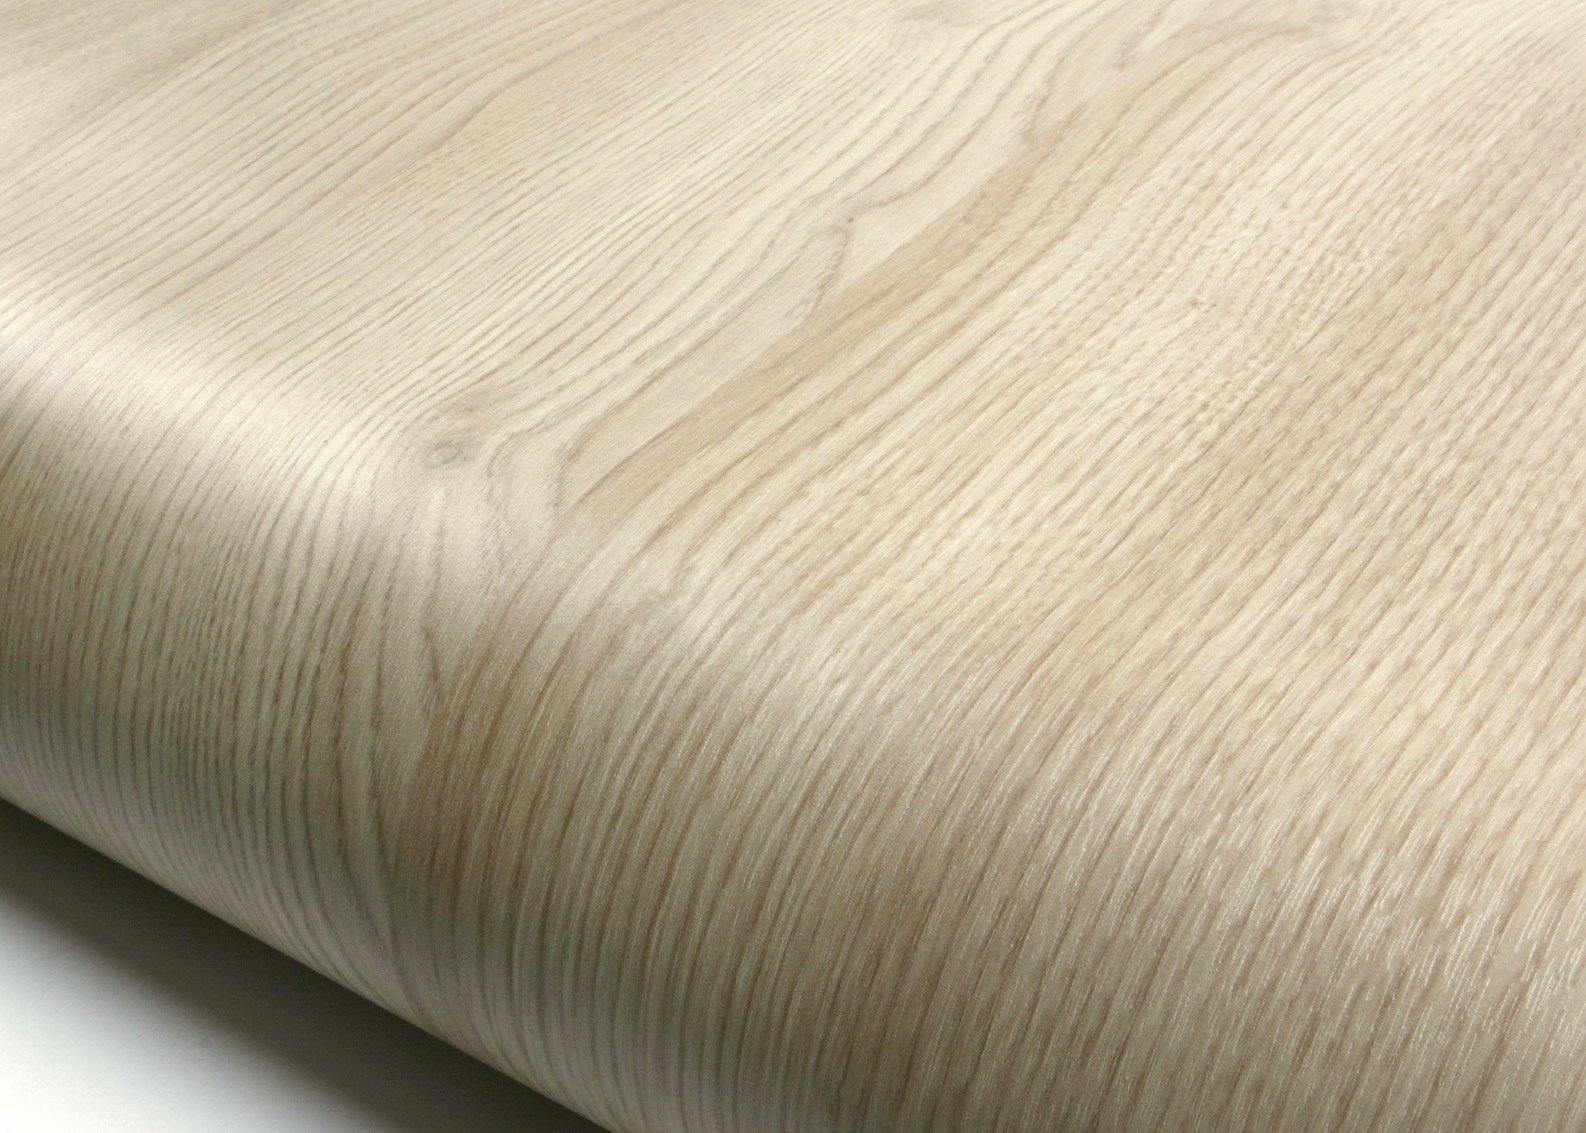 ROSEROSA Peel & Stick Flame Retardant Backsplash Rustic Trendy Oak Wood Textured Vinyl Contact Paper Self-adhesive Wallpaper Shelf Liner Table and Door Reform (PF4164-5 : 2.00 Feet X 6.56 Feet)